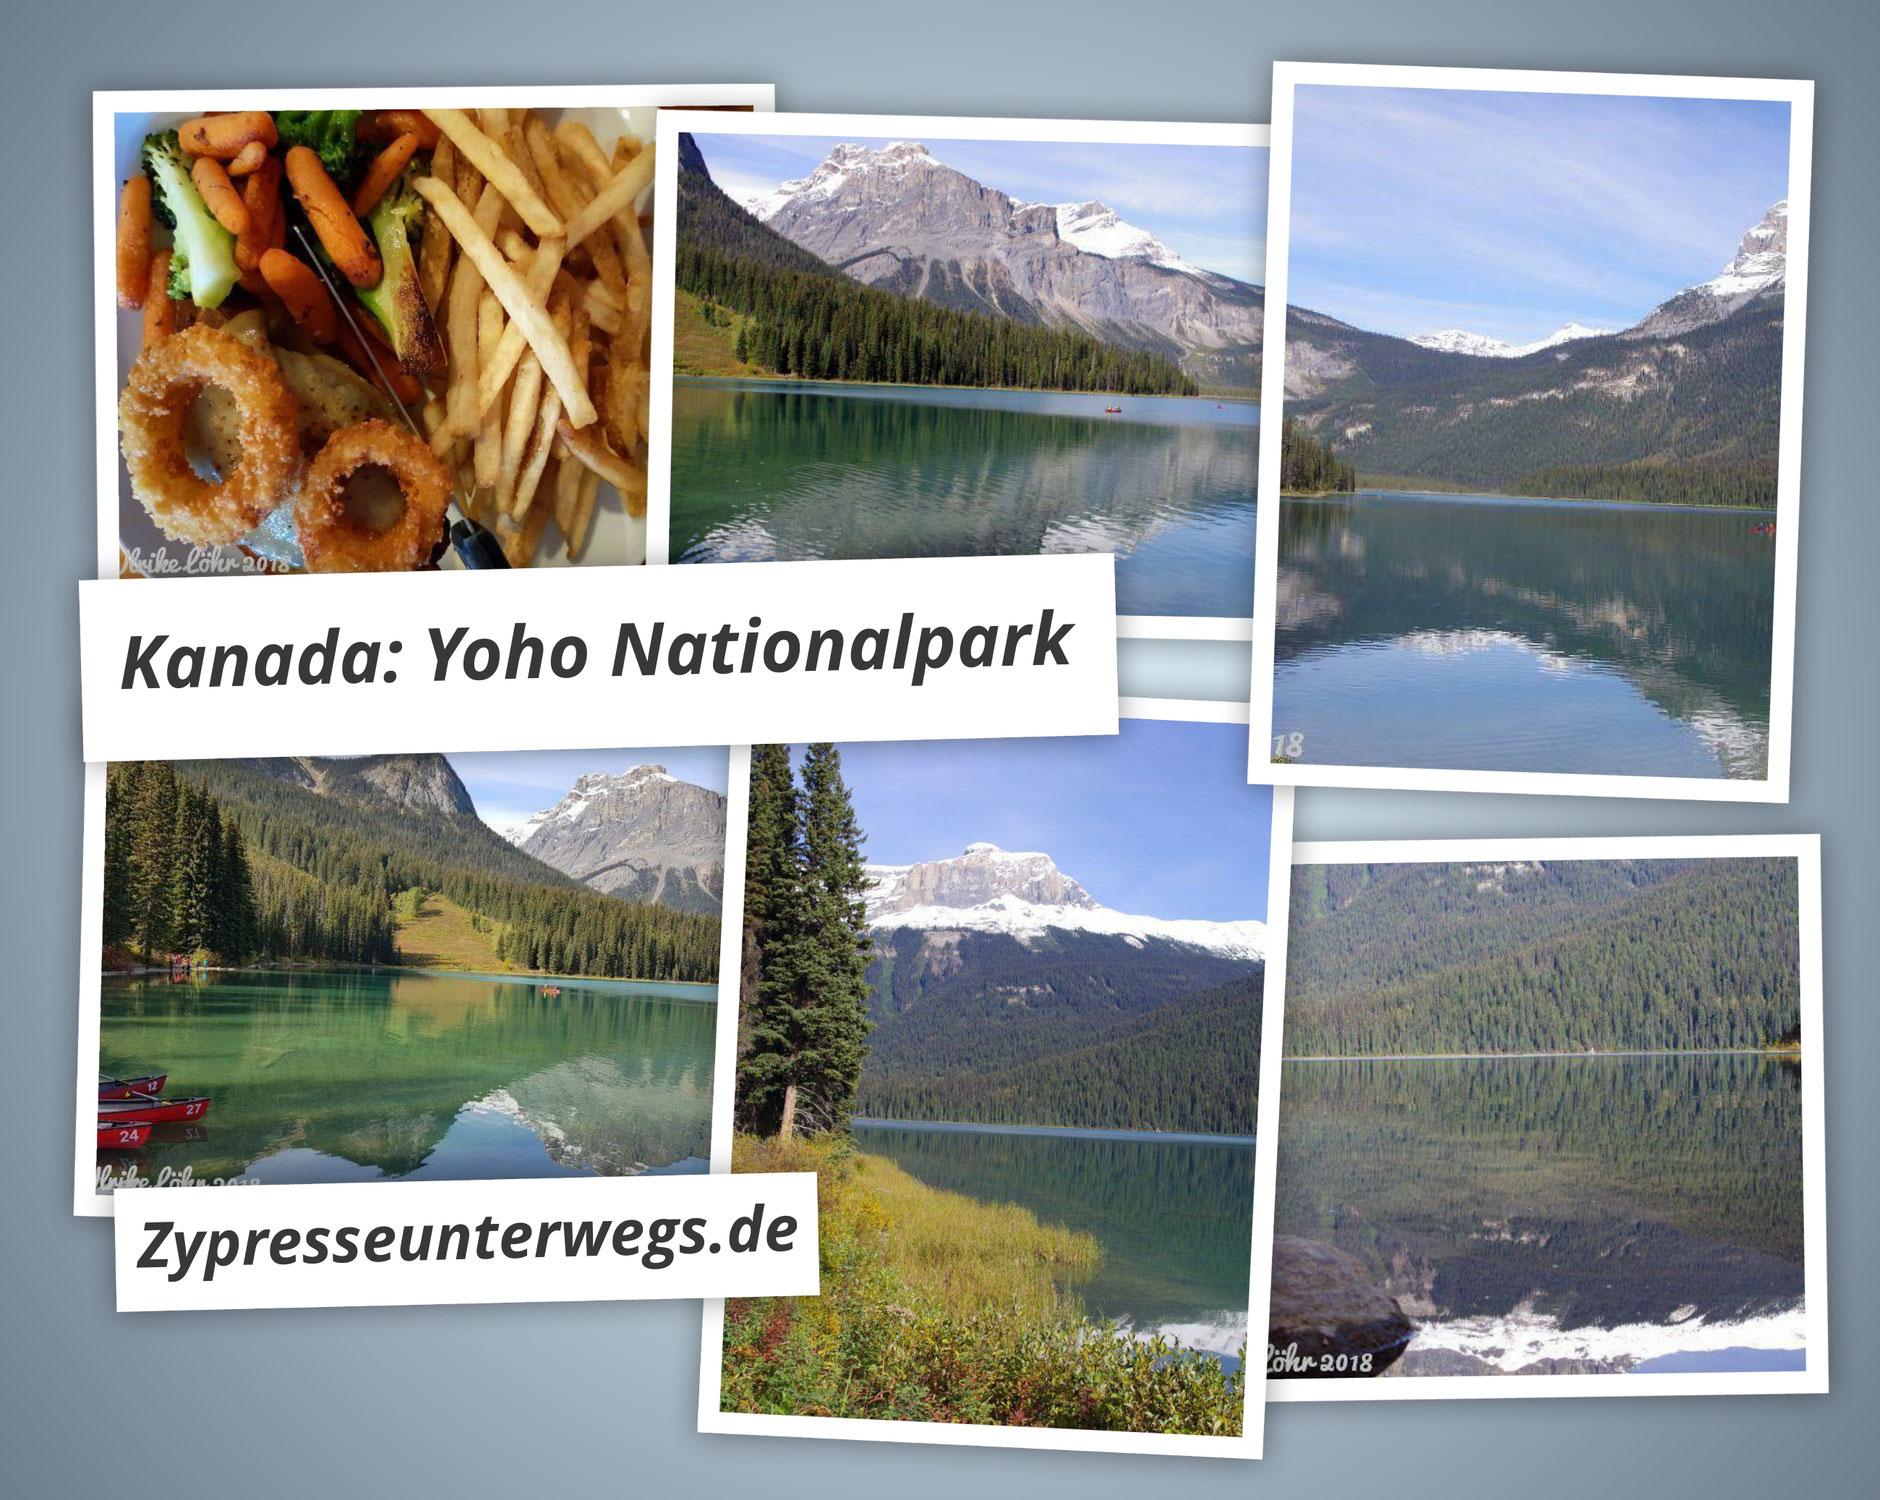 Kanada: Yoho Nationalpark